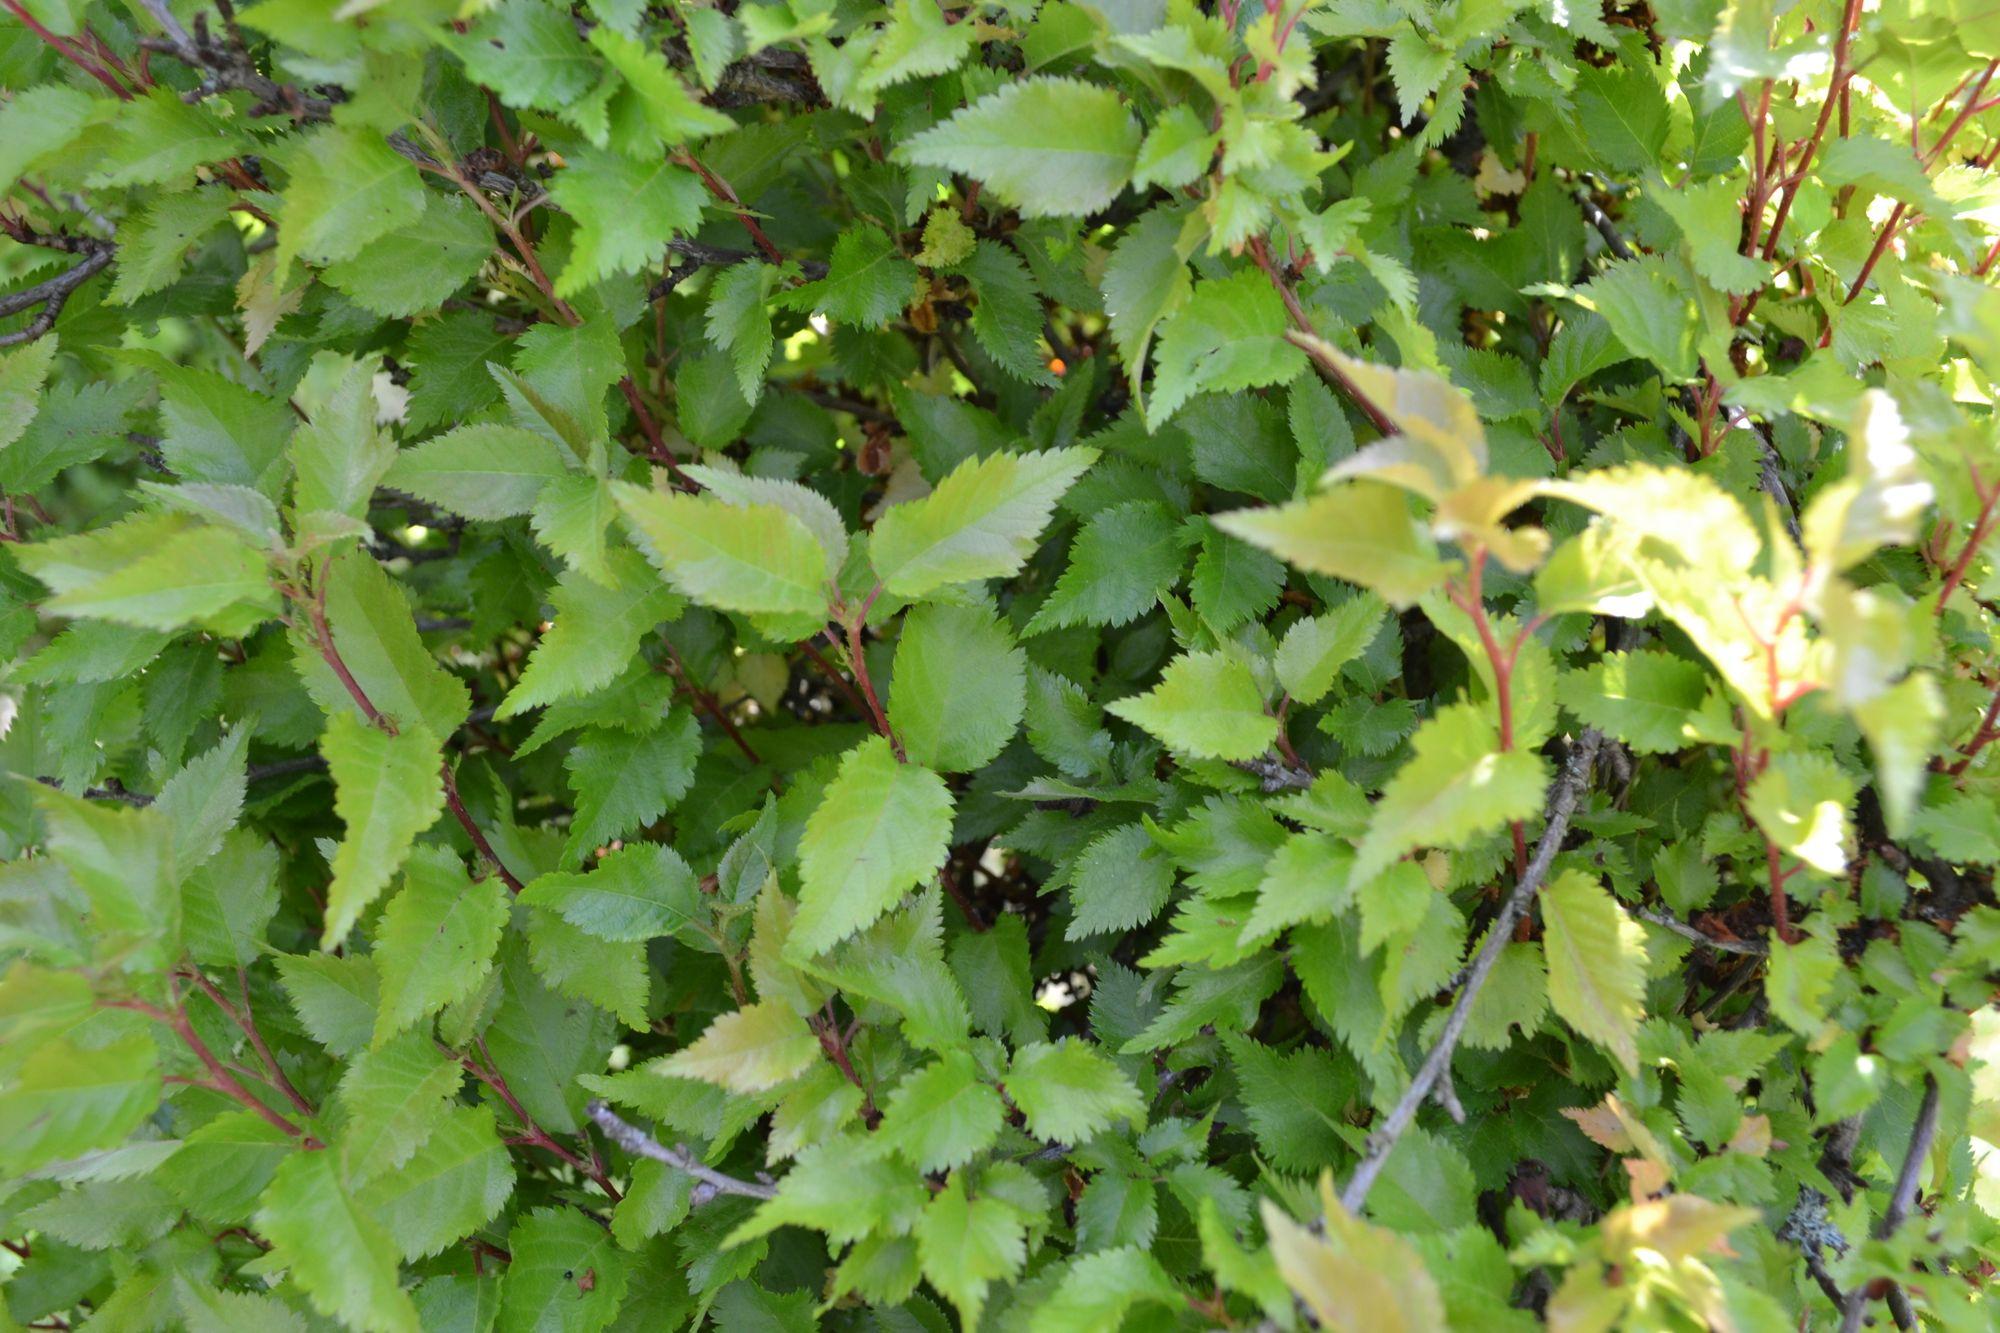 Ankstyvoji vyšnia 'February Pink' (Prunus incisa)